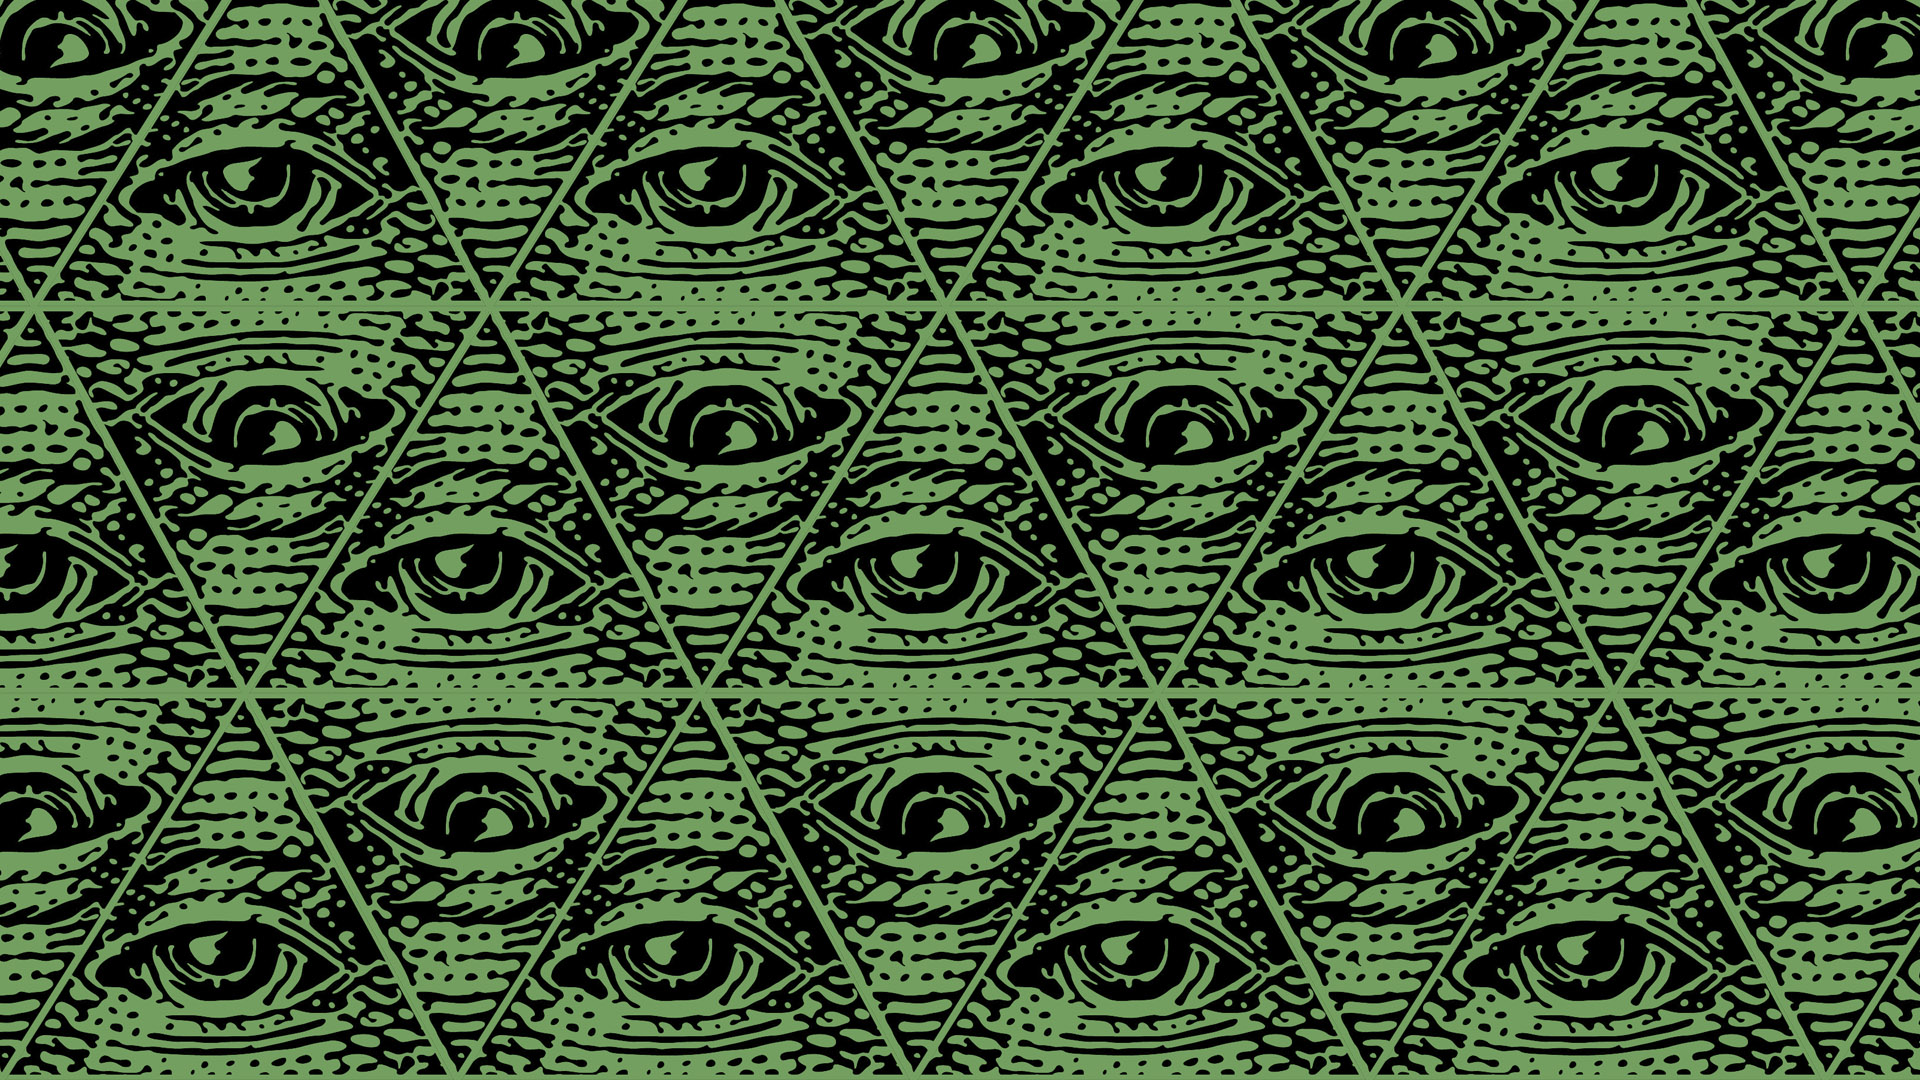 Weed Iphone X Wallpaper Desktop Illuminati Hd Wallpapers Pixelstalk Net